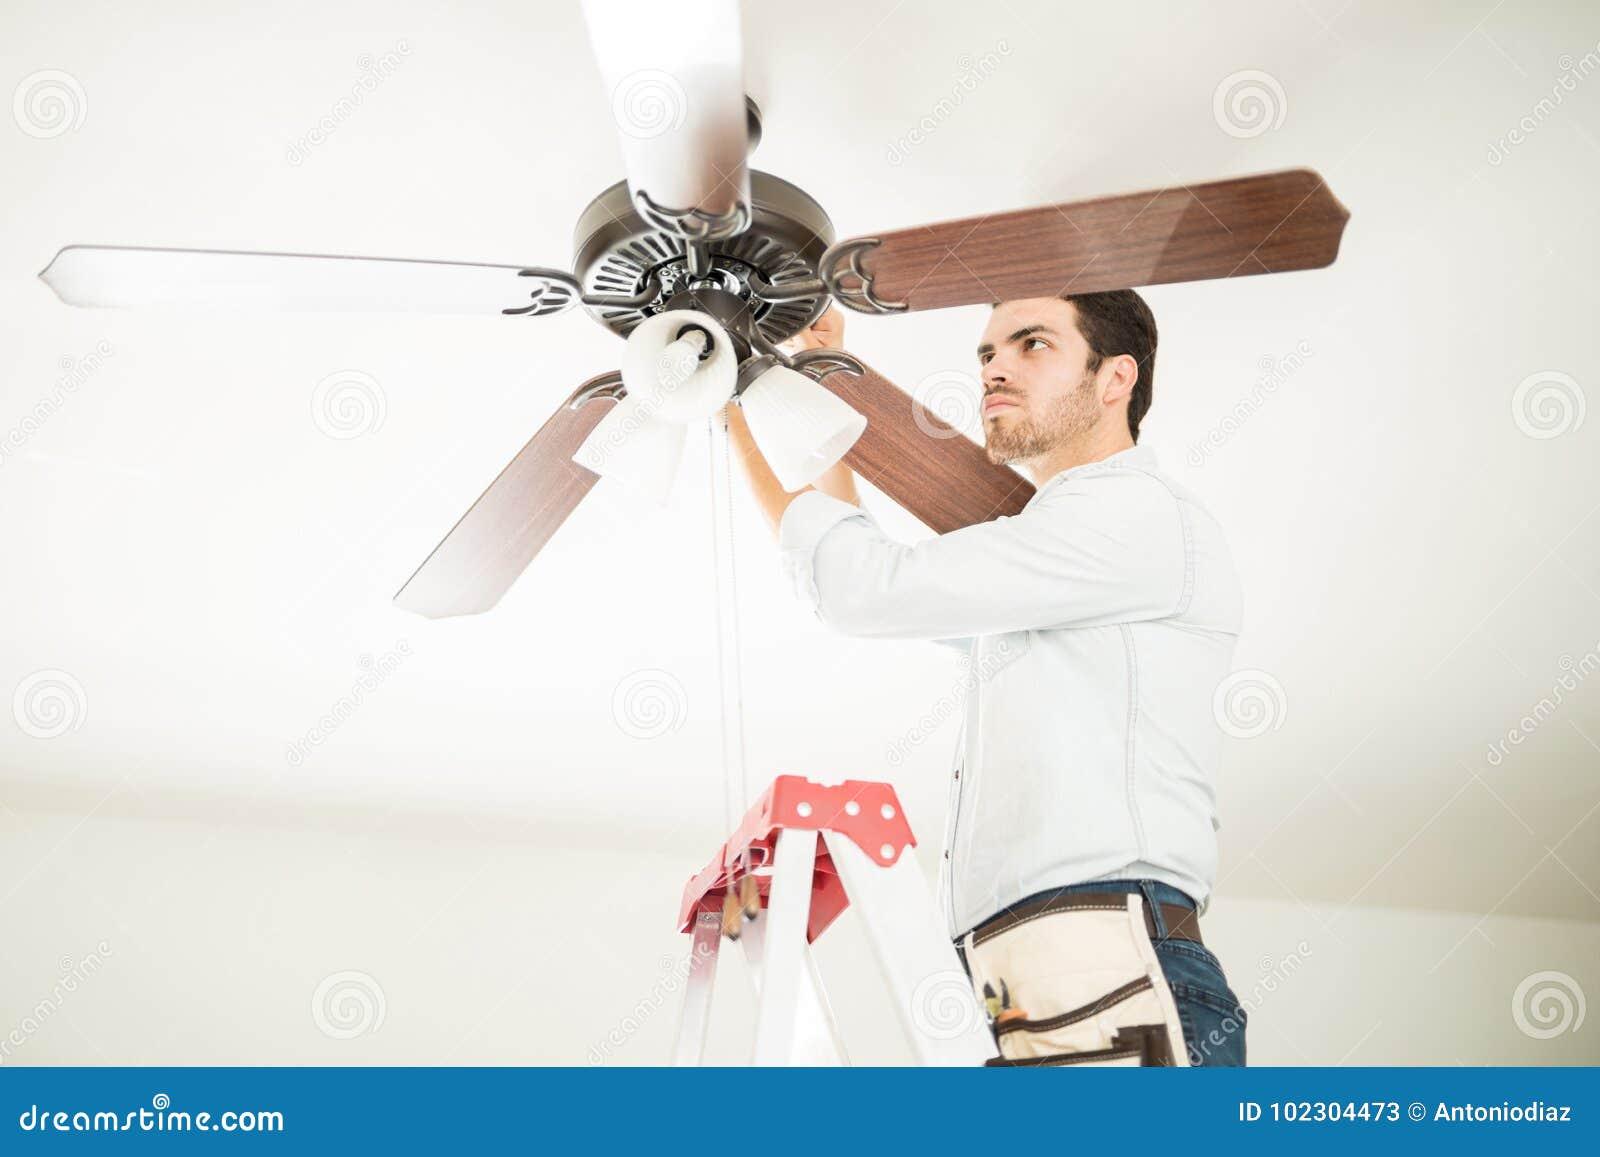 Man In Ladder Fixing Ceiling Fan Stock Image - Image of hispanic ...